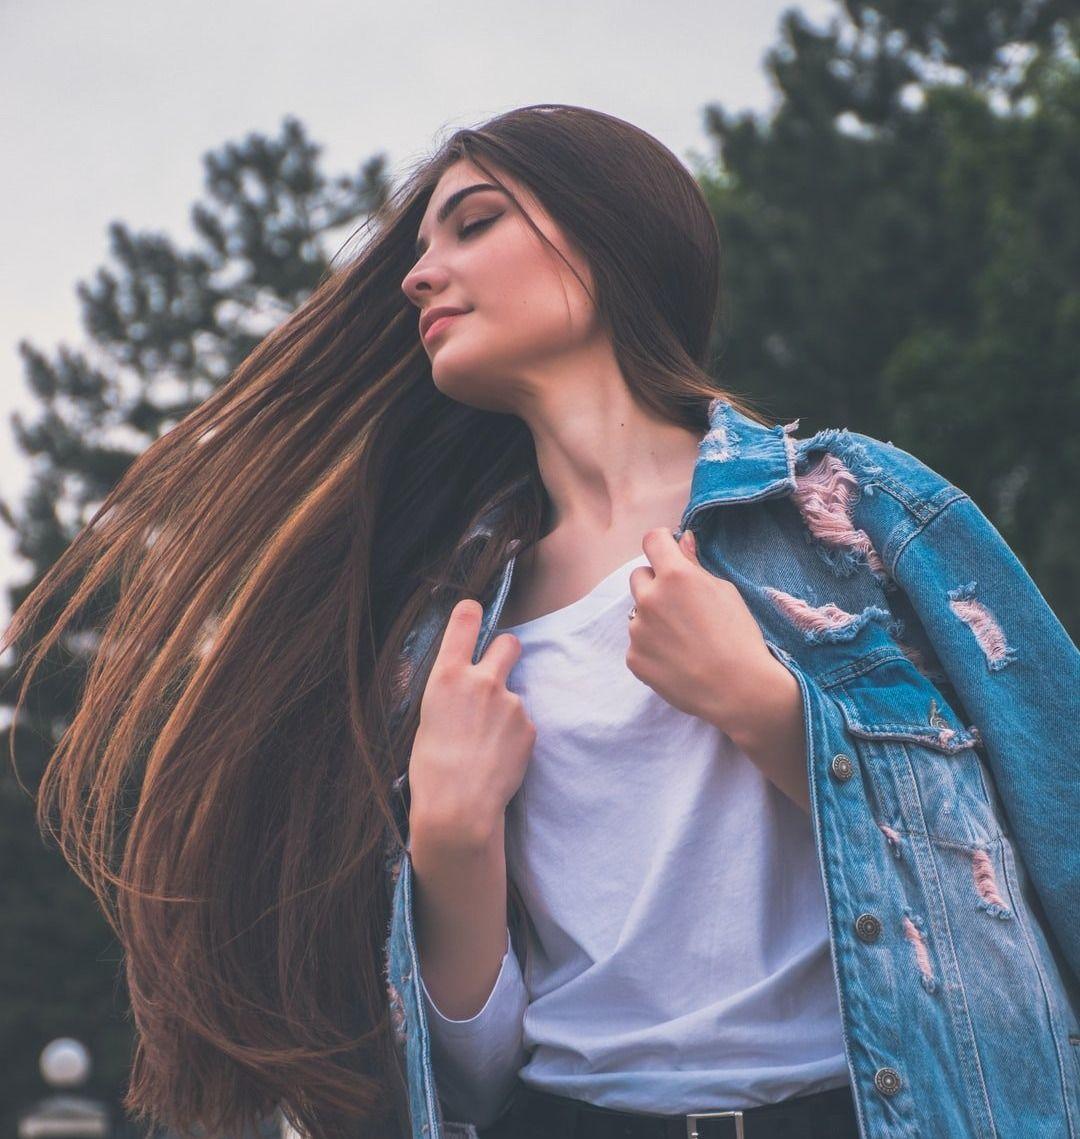 Jennifer Rose Hacker Noon profile picture